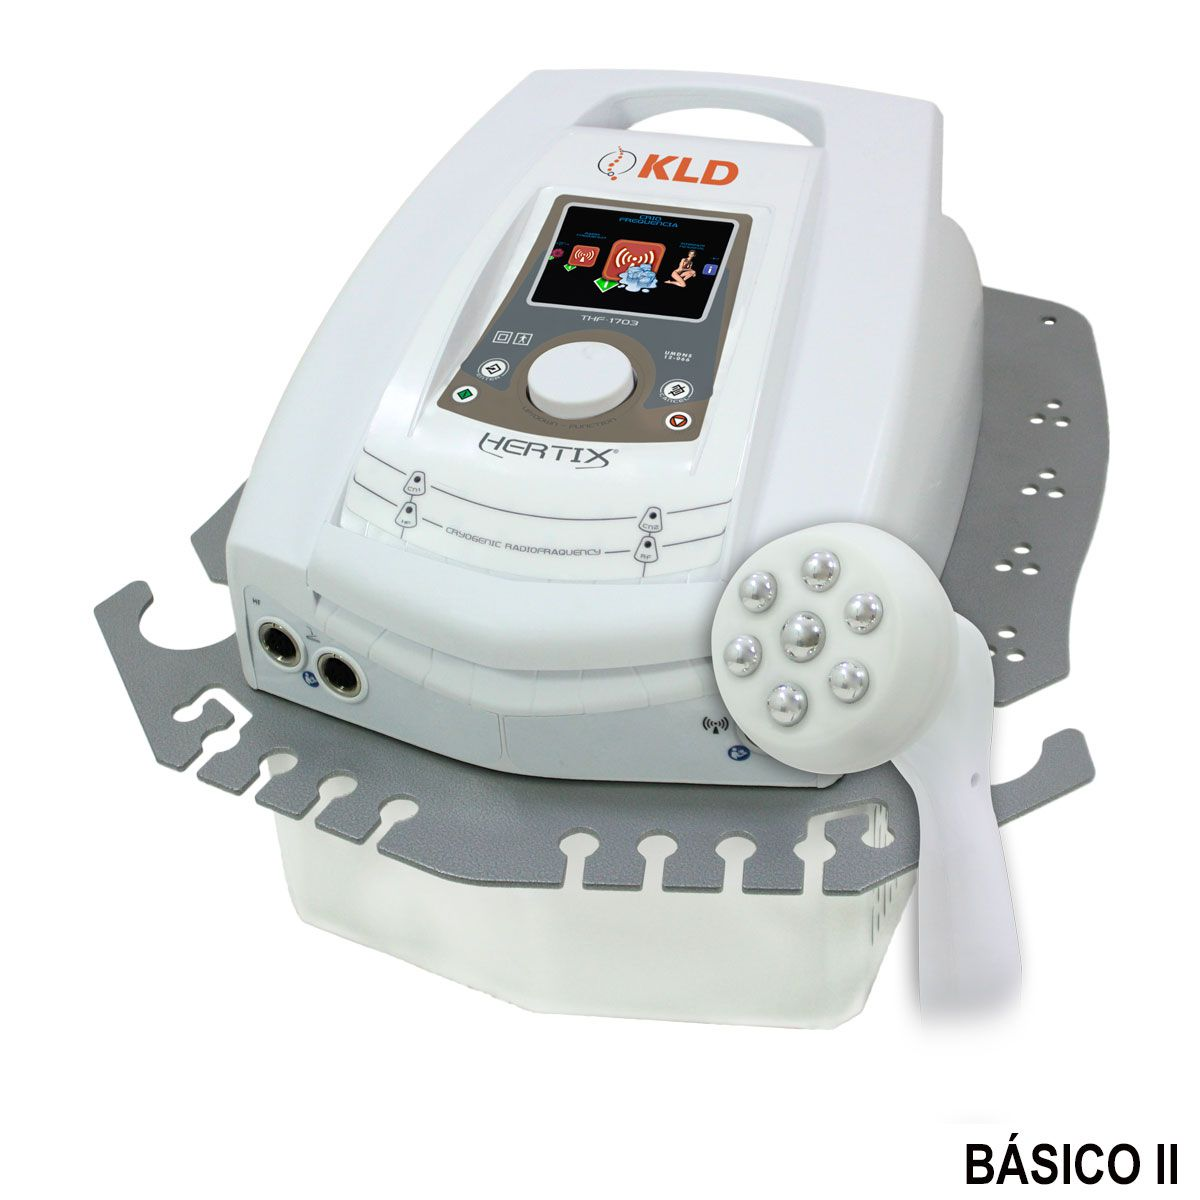 Hertix Smart Radiofrequência Criogênica THF 1703 BÁSICO II - KLD